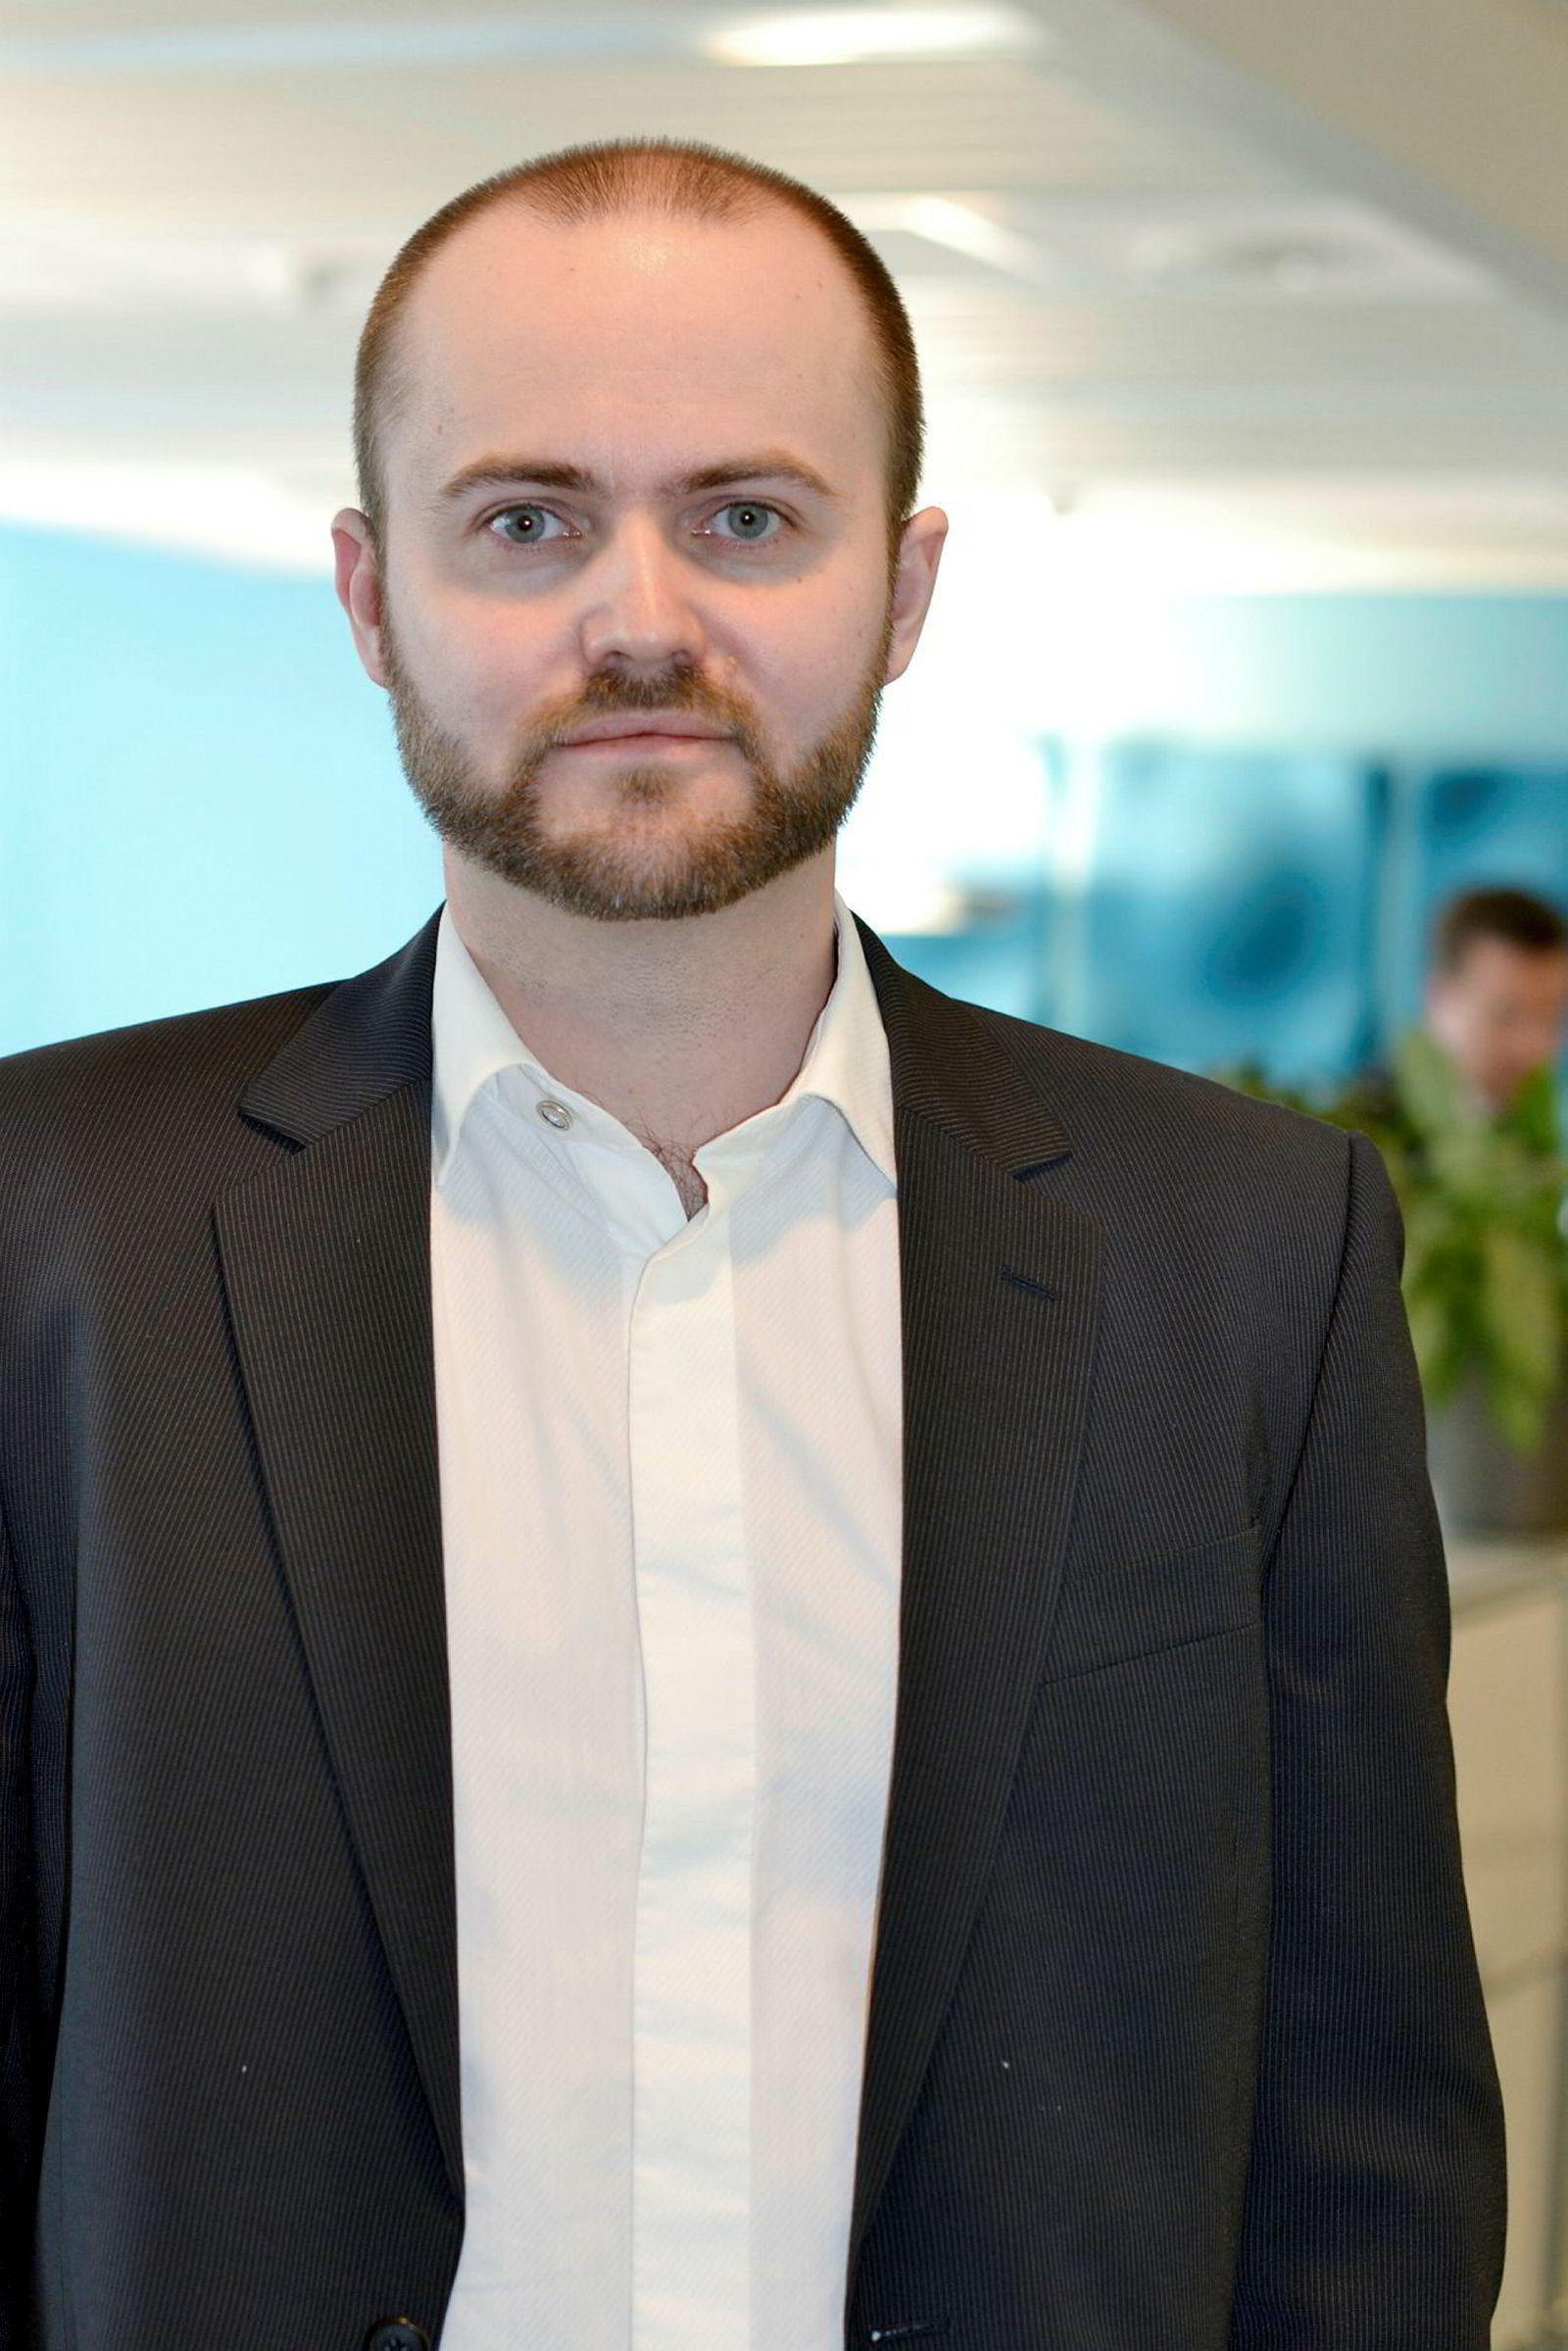 Analysesjef Bjørnar Tonhaugen, Rystad Energy.